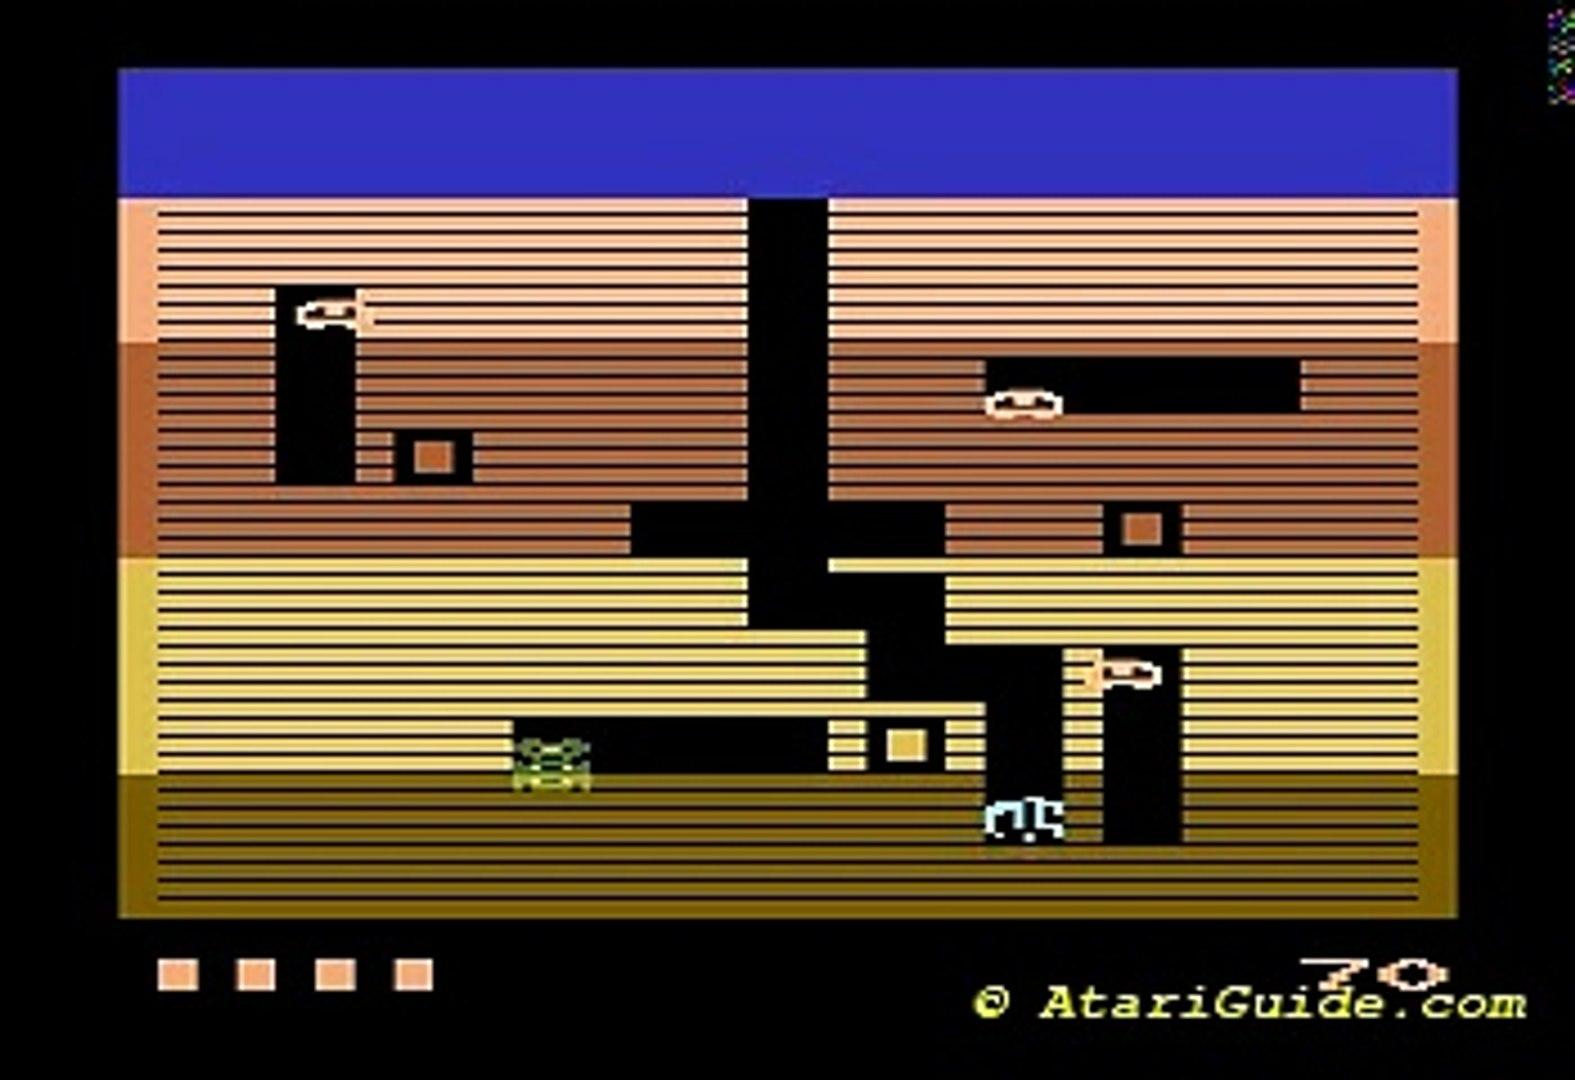 Atari 2600 Dig Dug 1983 Atari - GCC, Doug Macrae CX2677, CX